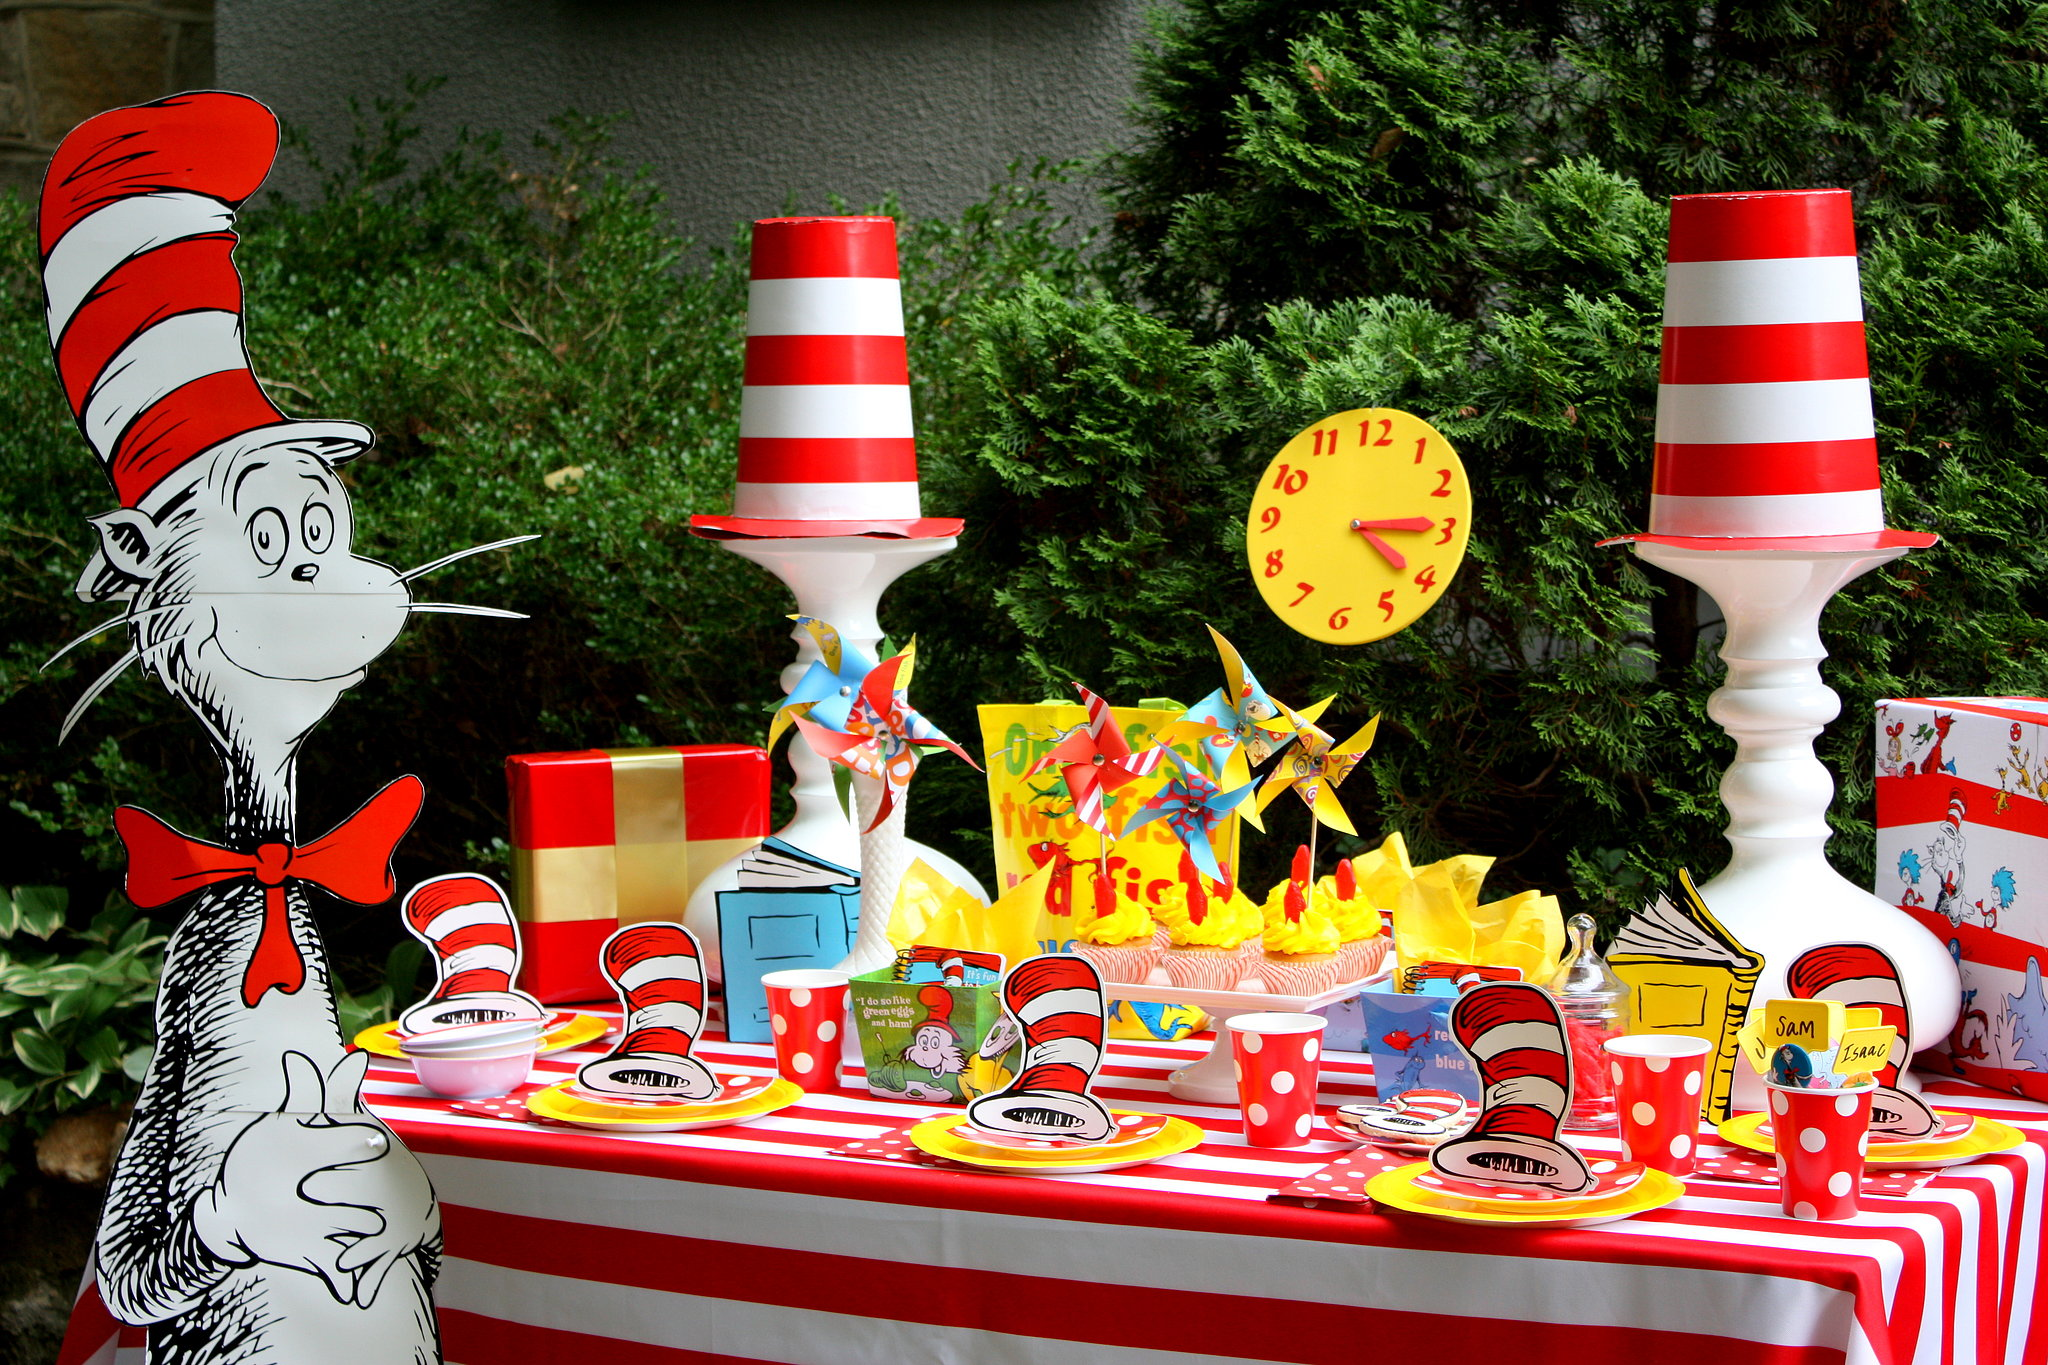 Dr. Seuss Birthday Party Ideas - FREE Printables